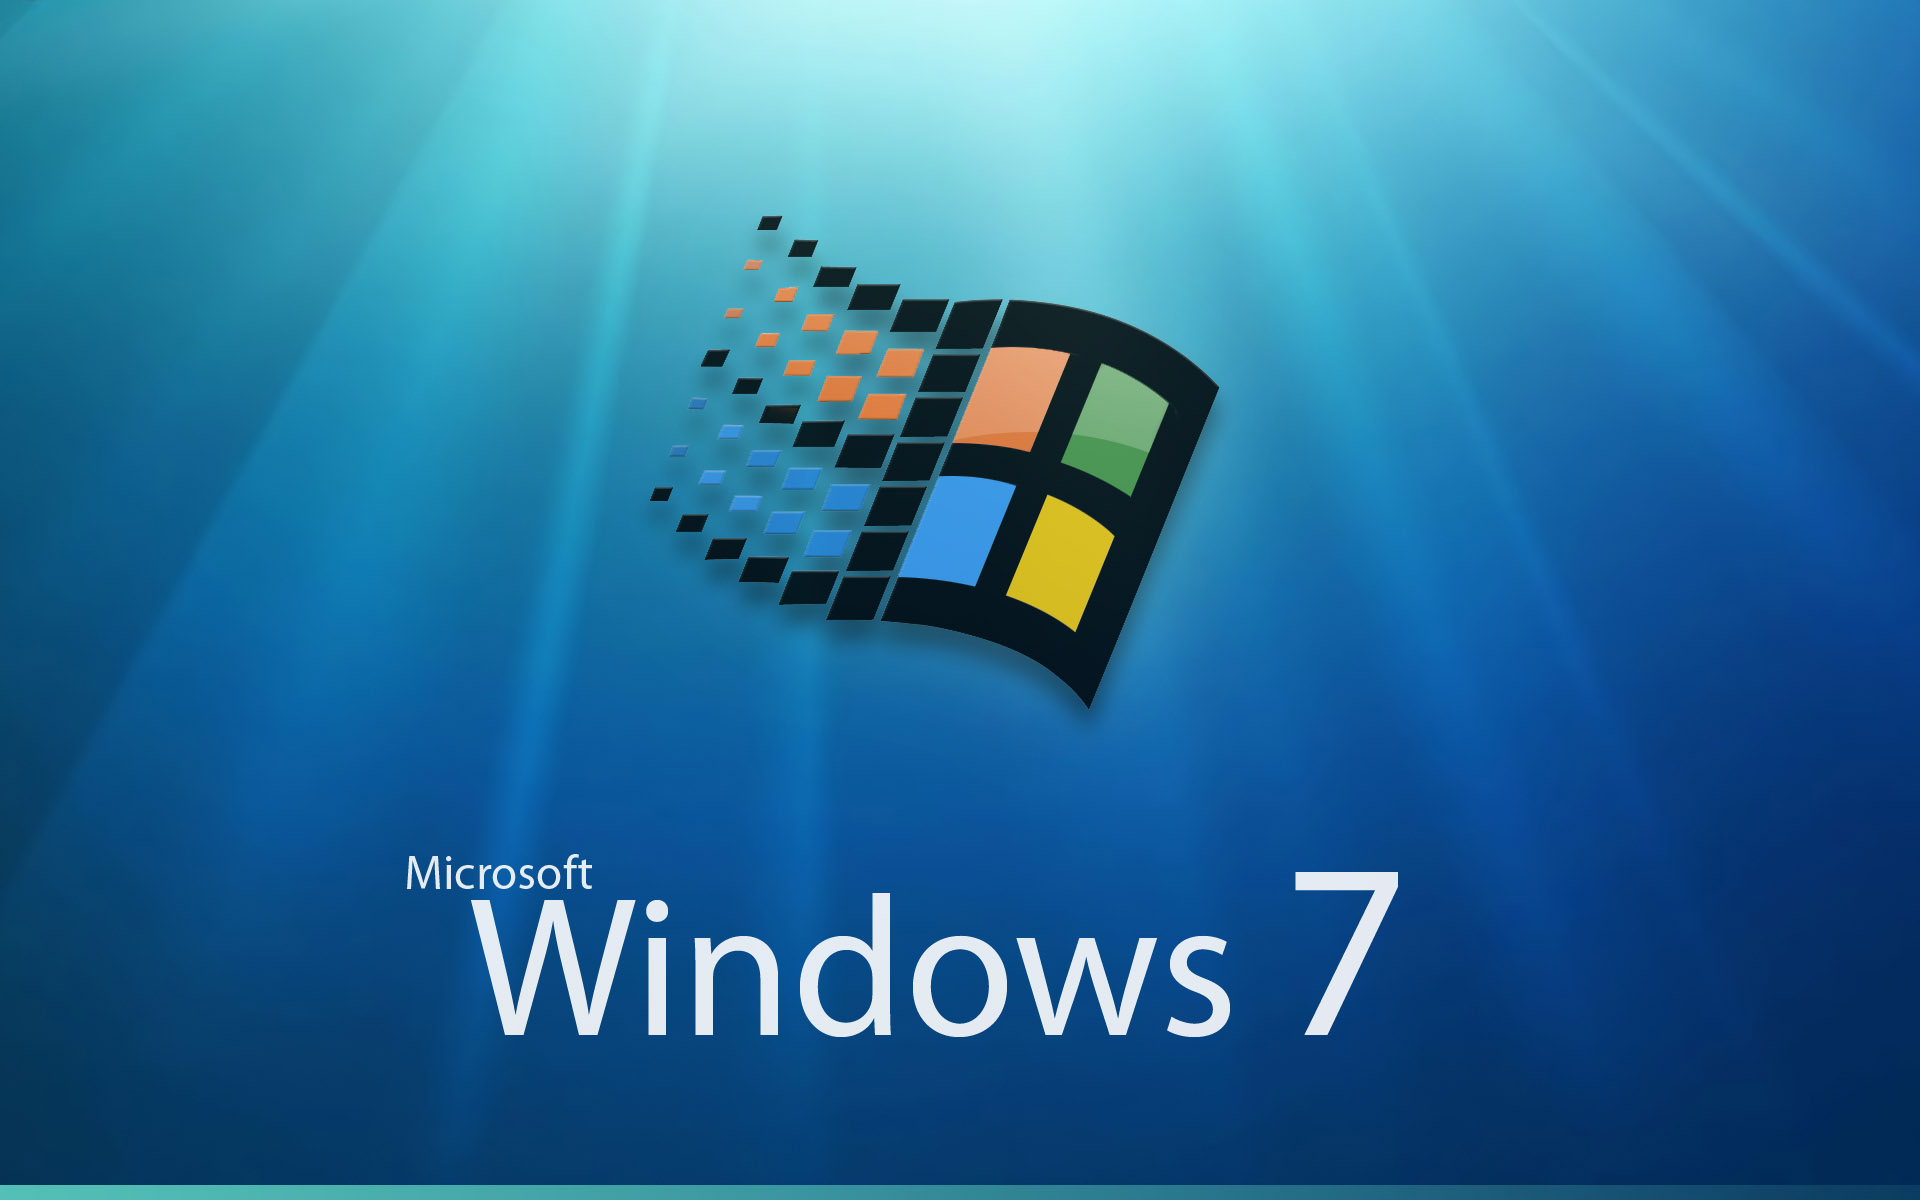 microsoft windows 7 logo desktop wallpaper pictures microsoft windows 1920x1200